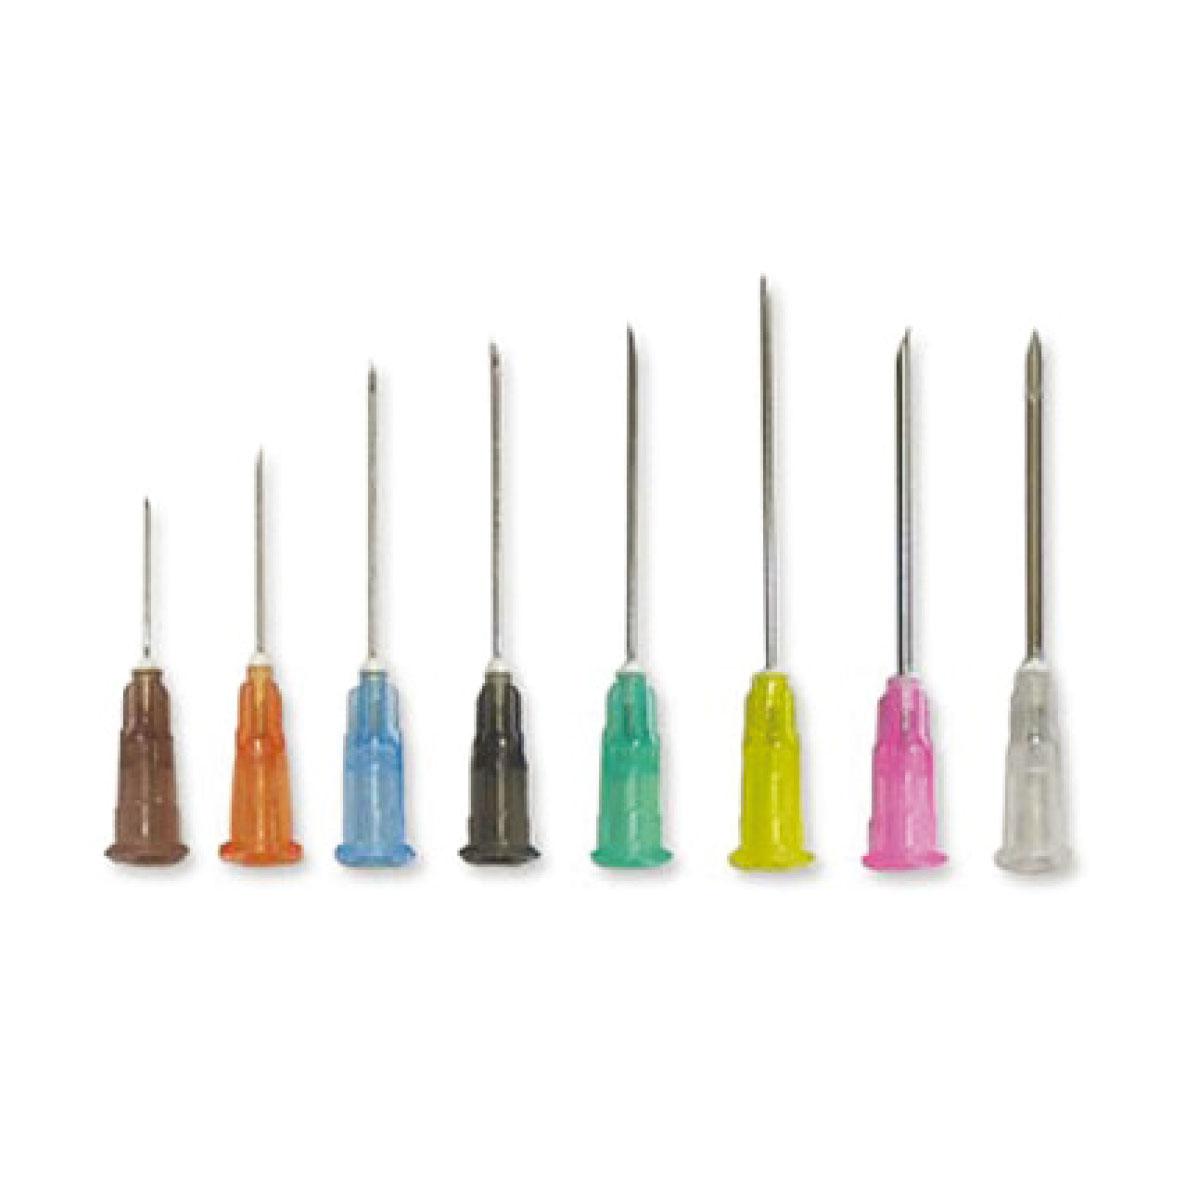 BD Microlance Hypodermic Needles